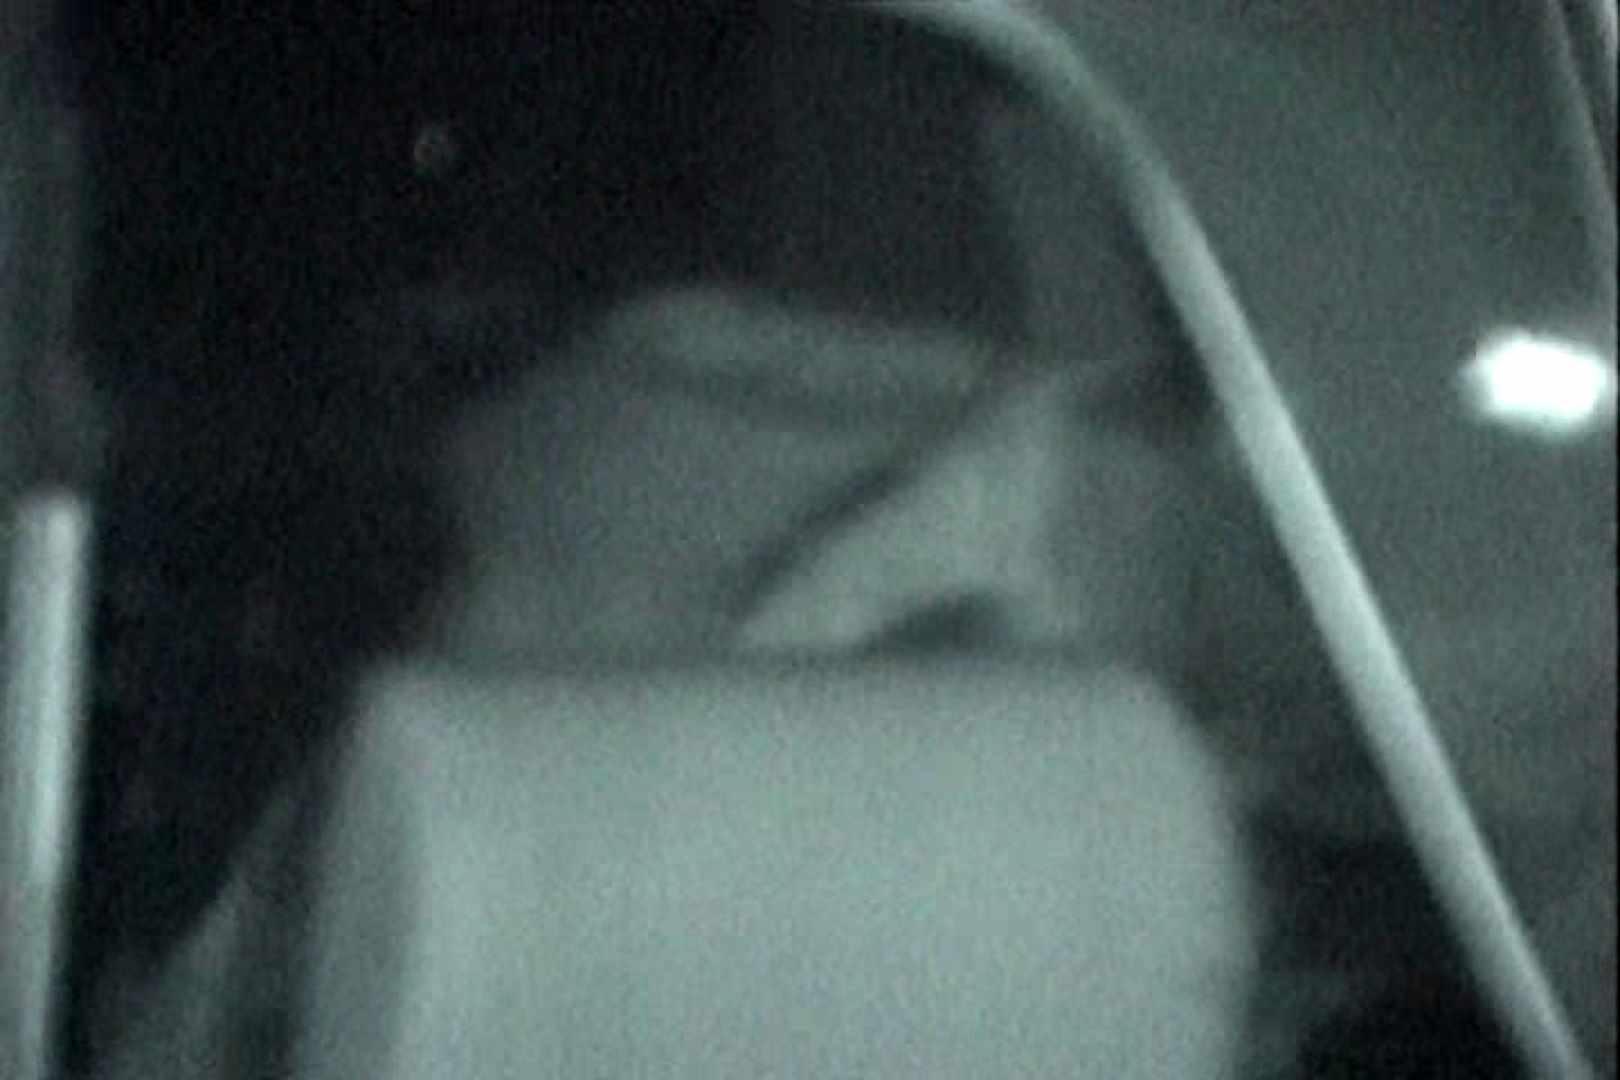 充血監督の深夜の運動会Vol.144 美女OL  46連発 24